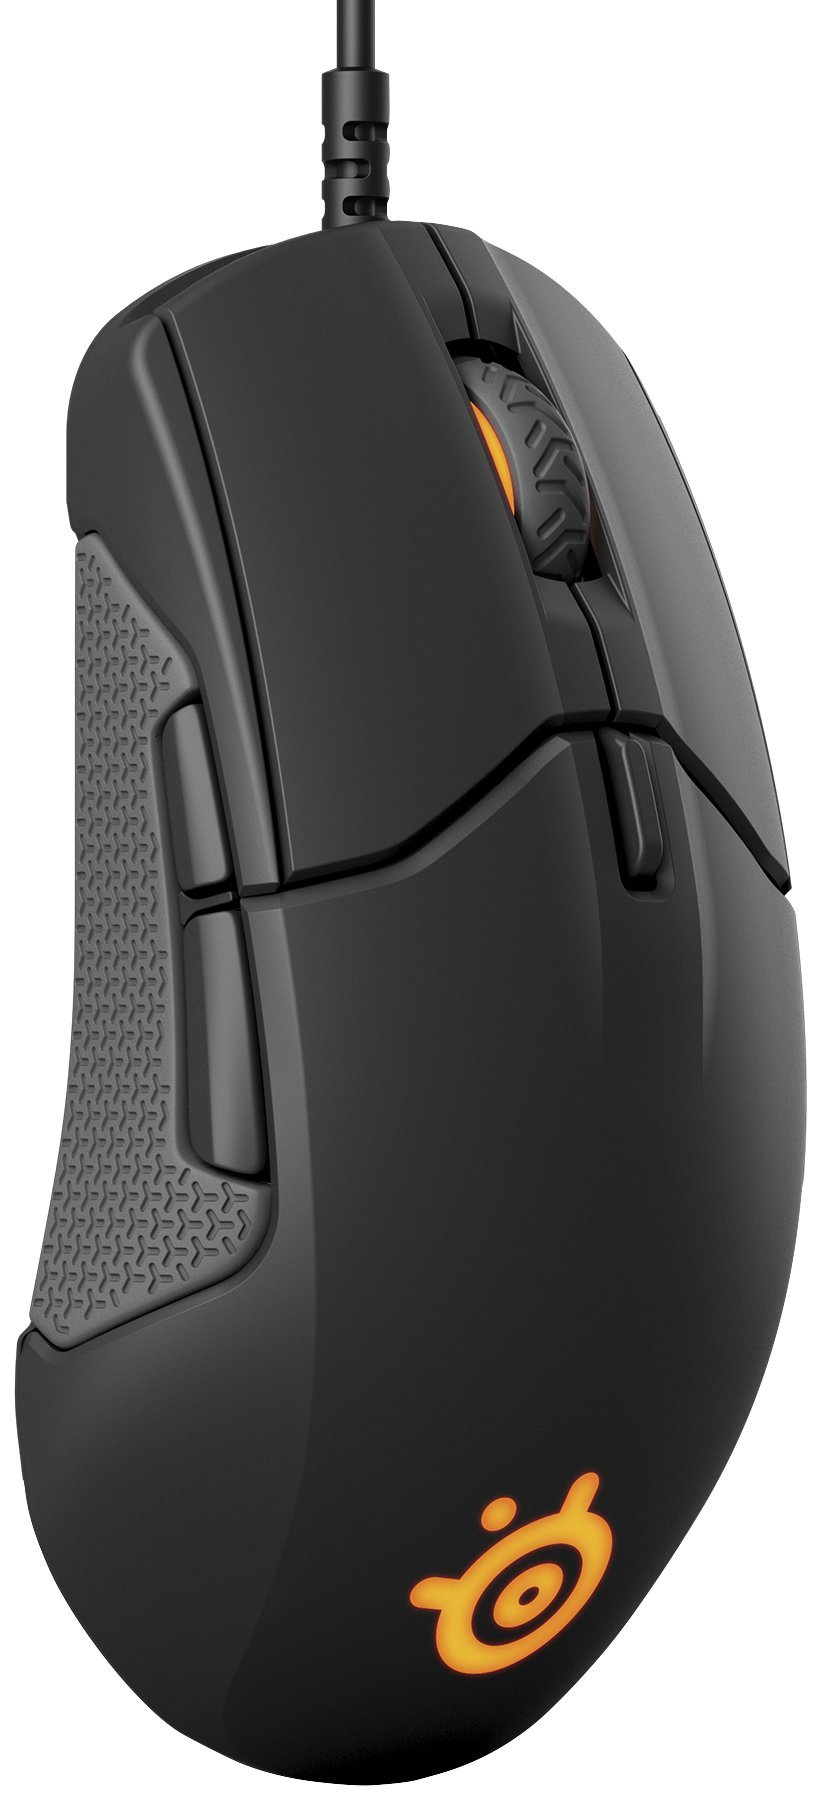 SteelSeries Sensei 310 Gaming Mouse - 12,000 CPI TrueMove3 Optical Sensor - Ambidextrous Design - Split-Trigger Buttons - RGB Lighting by SteelSeries (Image #4)